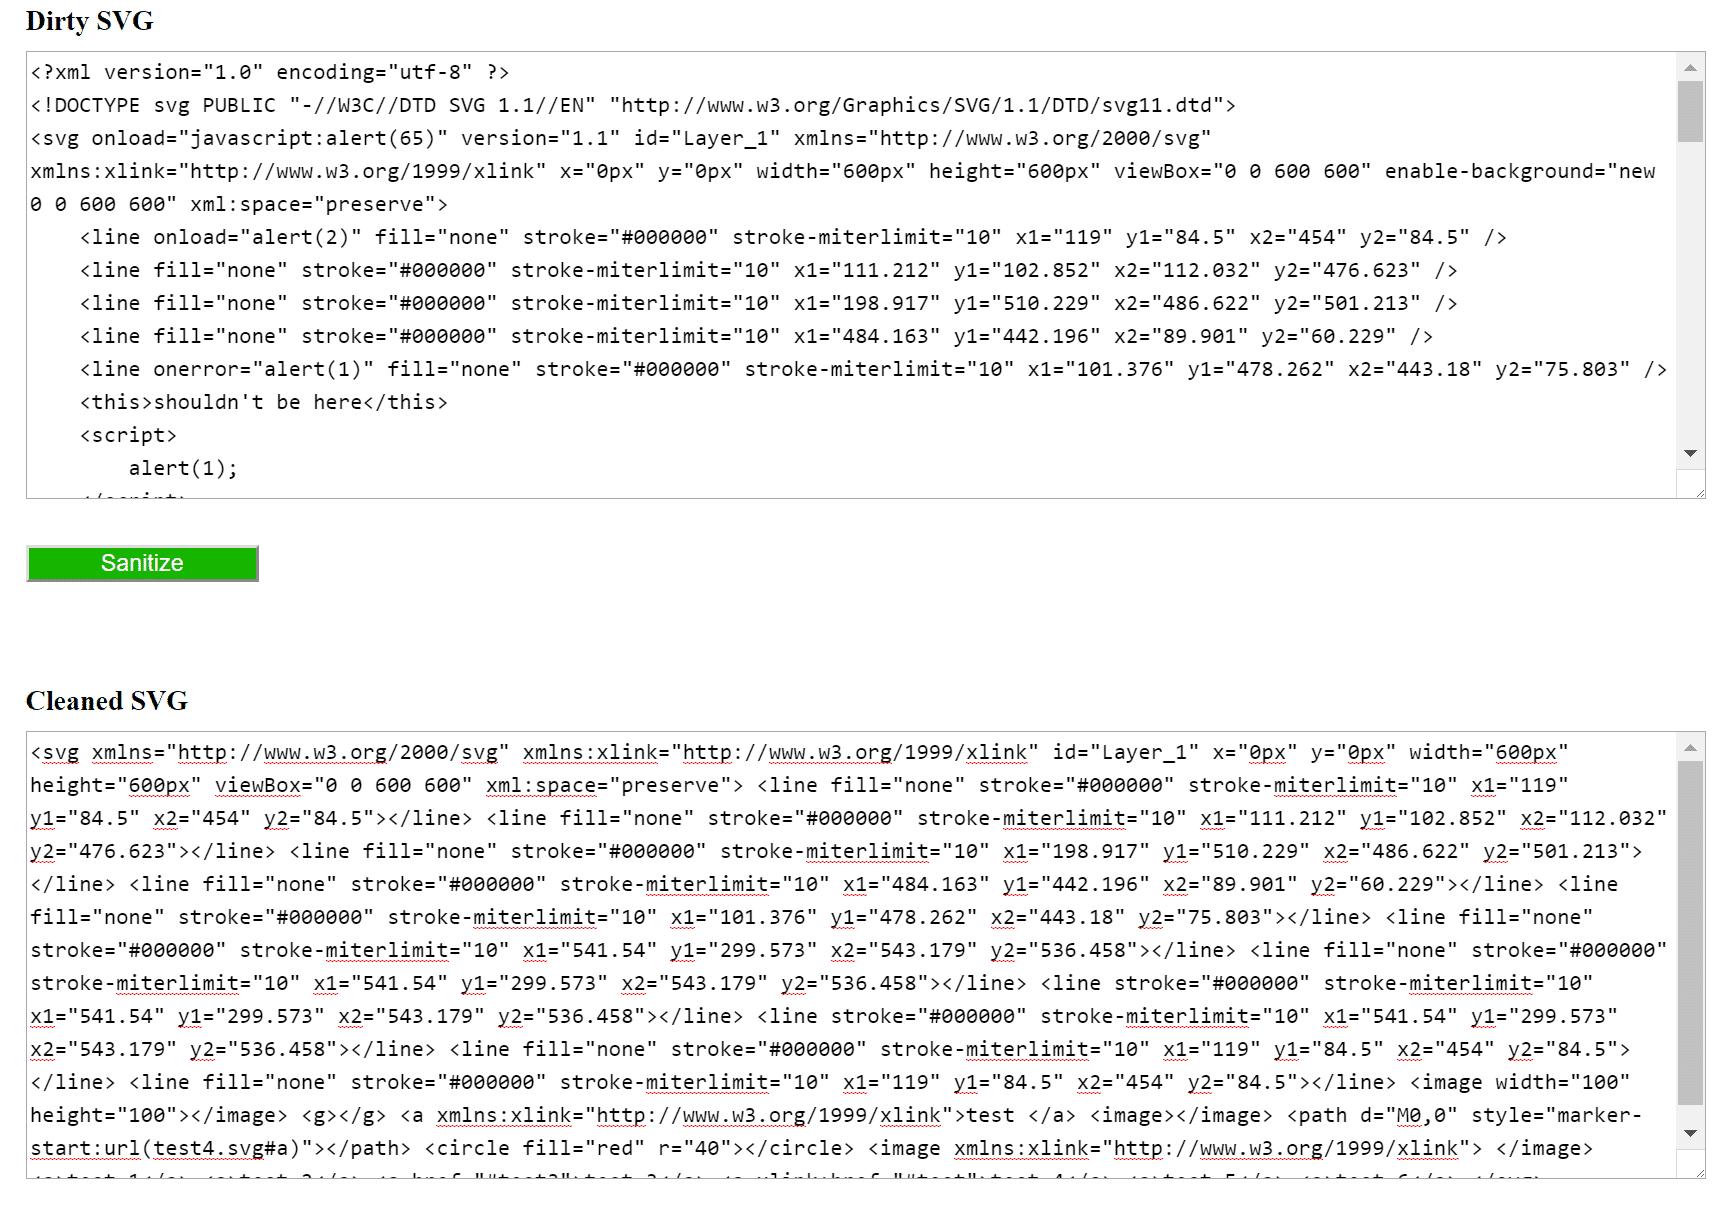 Démonstration du nettoyeur de SVG